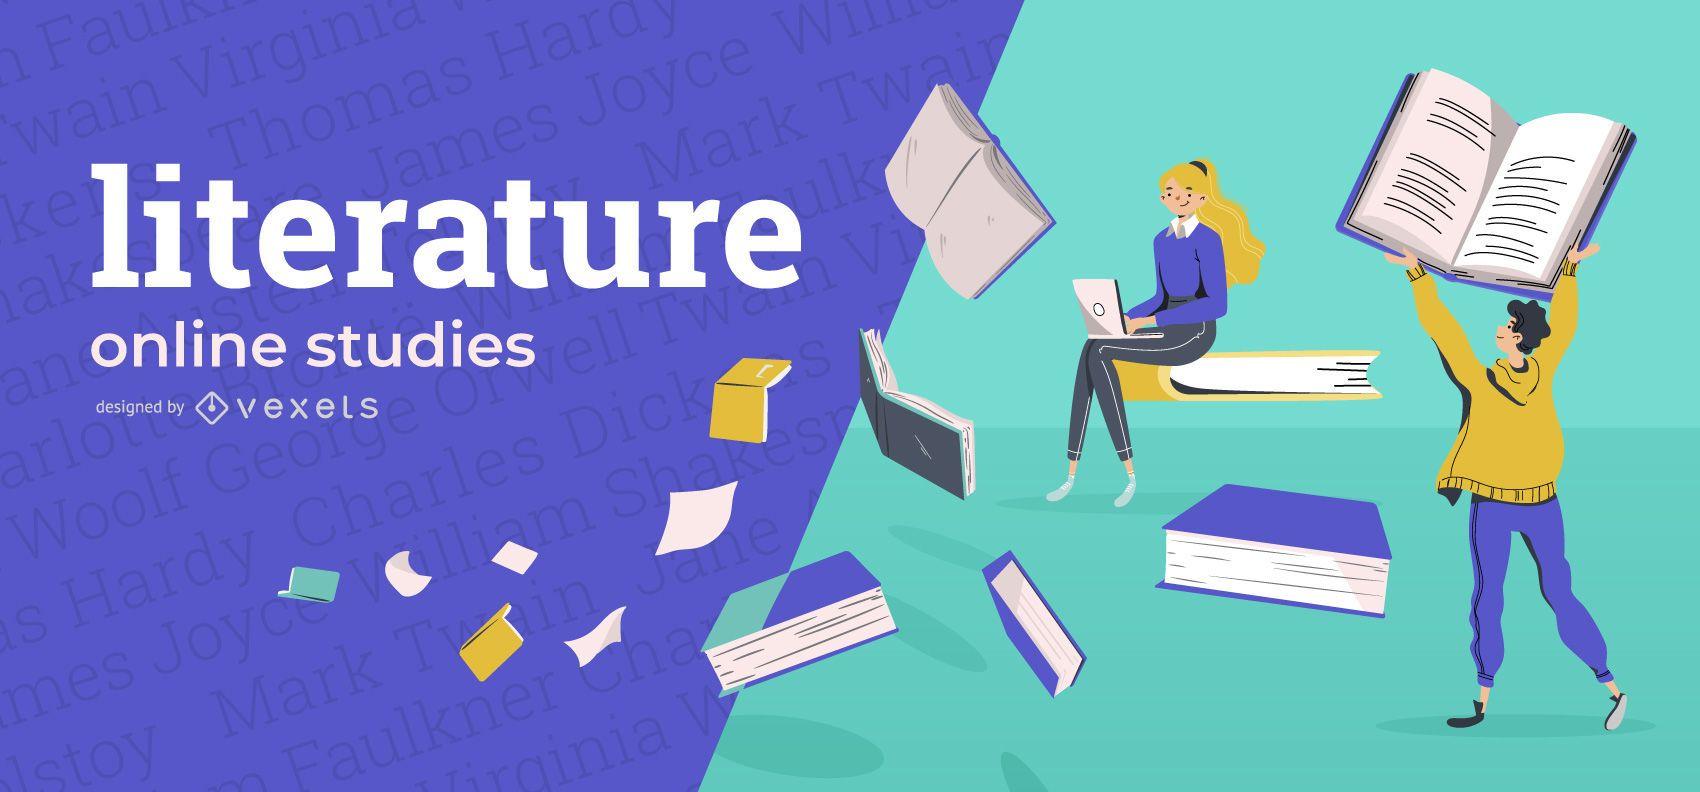 Literature online education cover